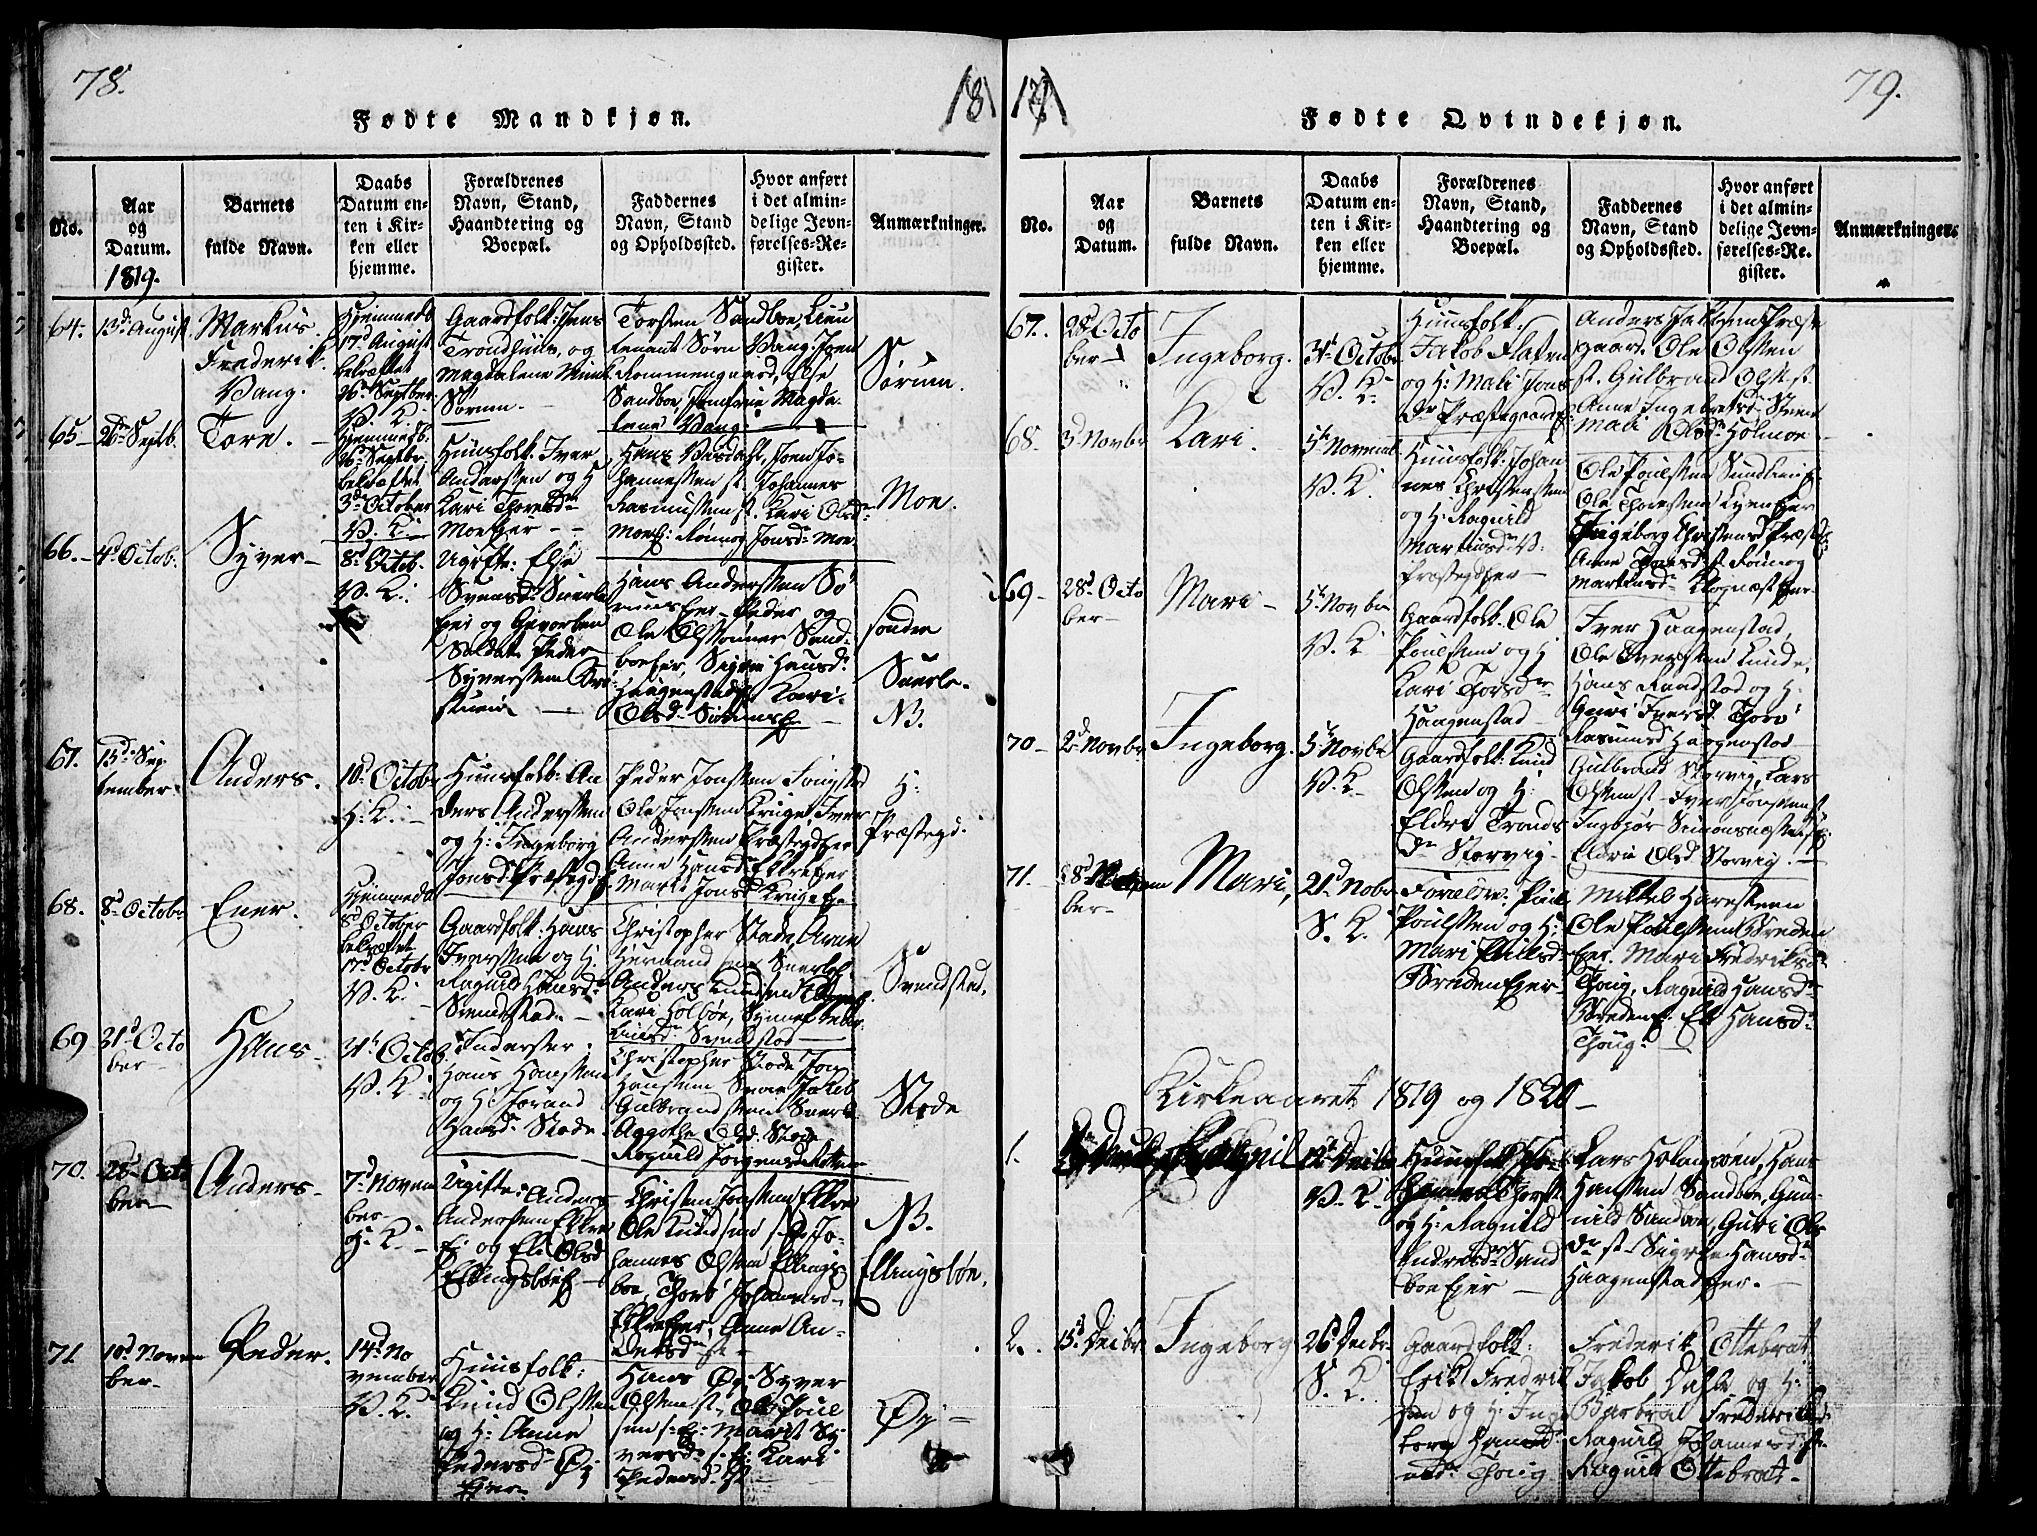 SAH, Vågå prestekontor, Ministerialbok nr. 3, 1815-1827, s. 78-79